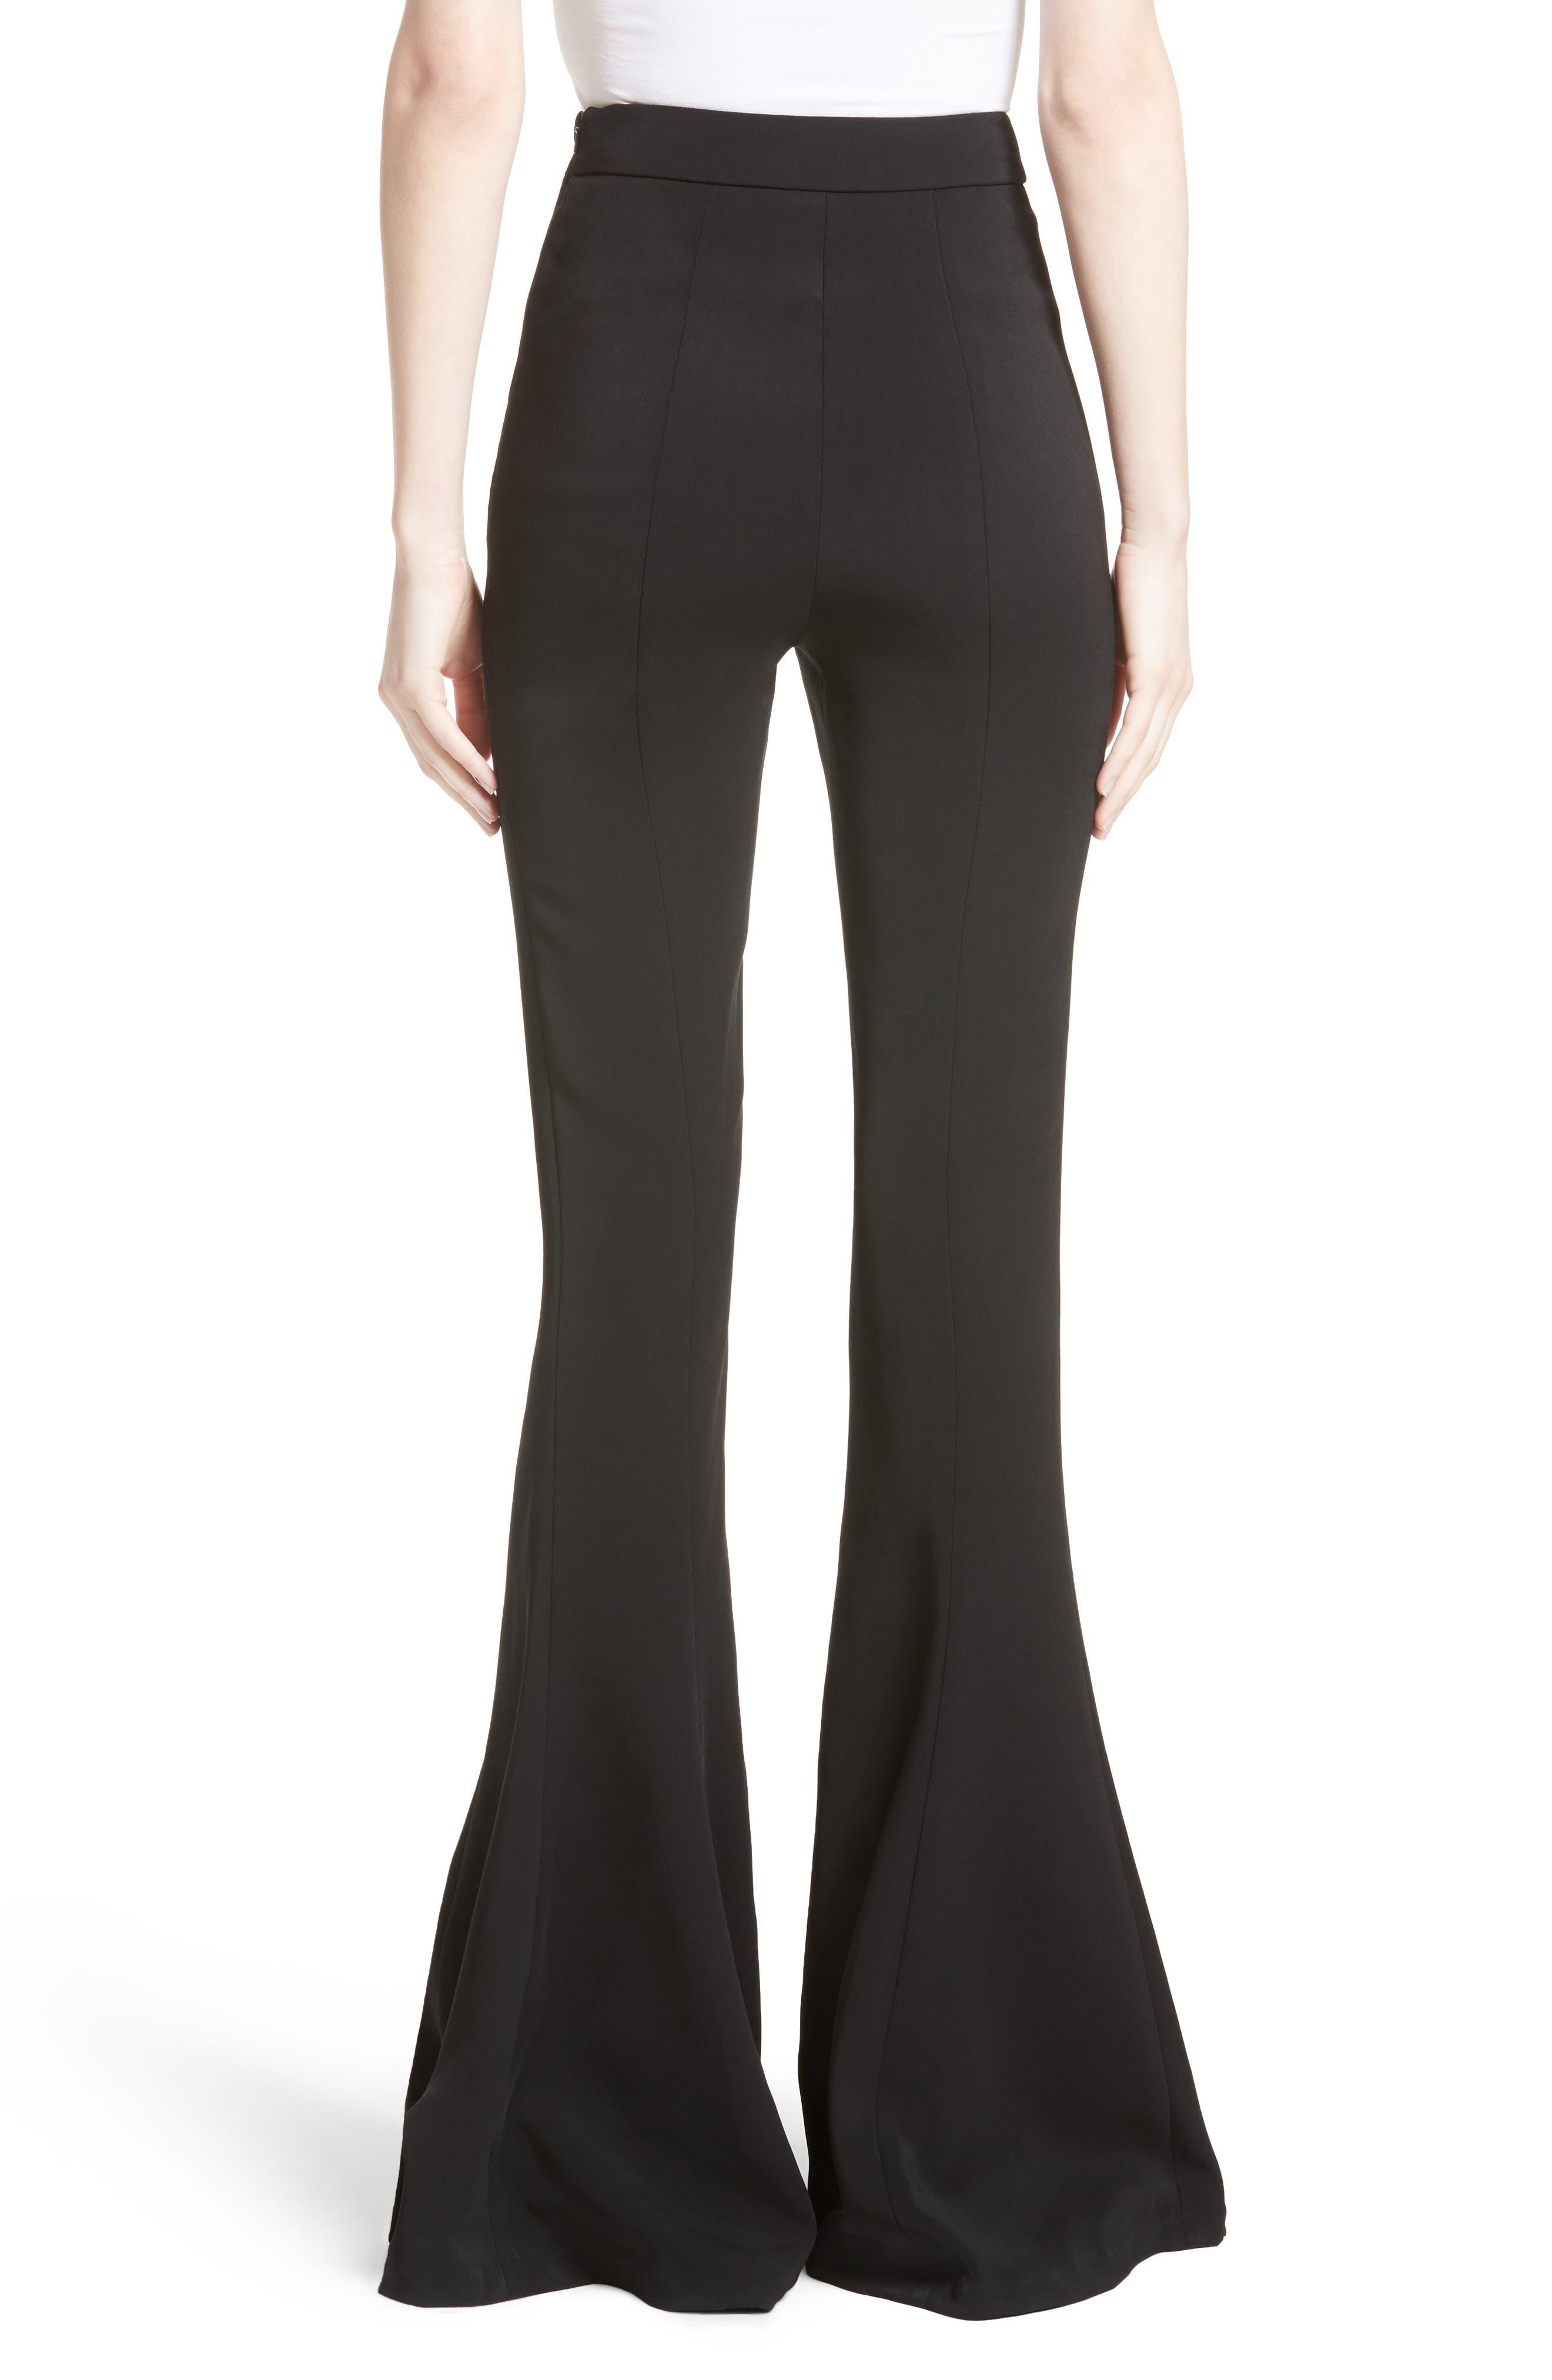 Naomi High Waist Flare Pants,                             Alternate thumbnail 2, color,                             001